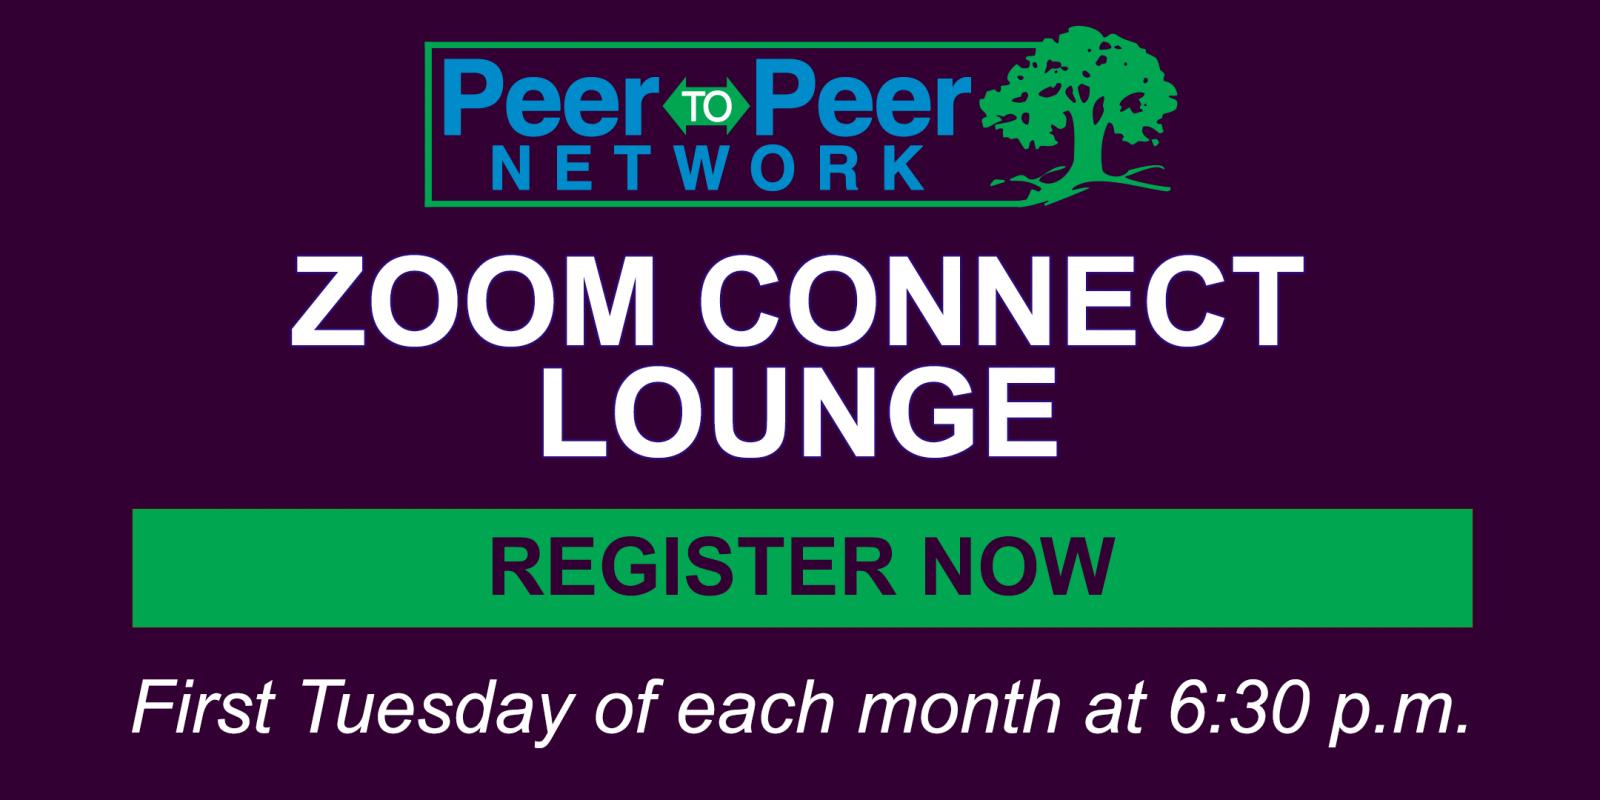 LO Peer to Peer Network Zoom Connect Lounge